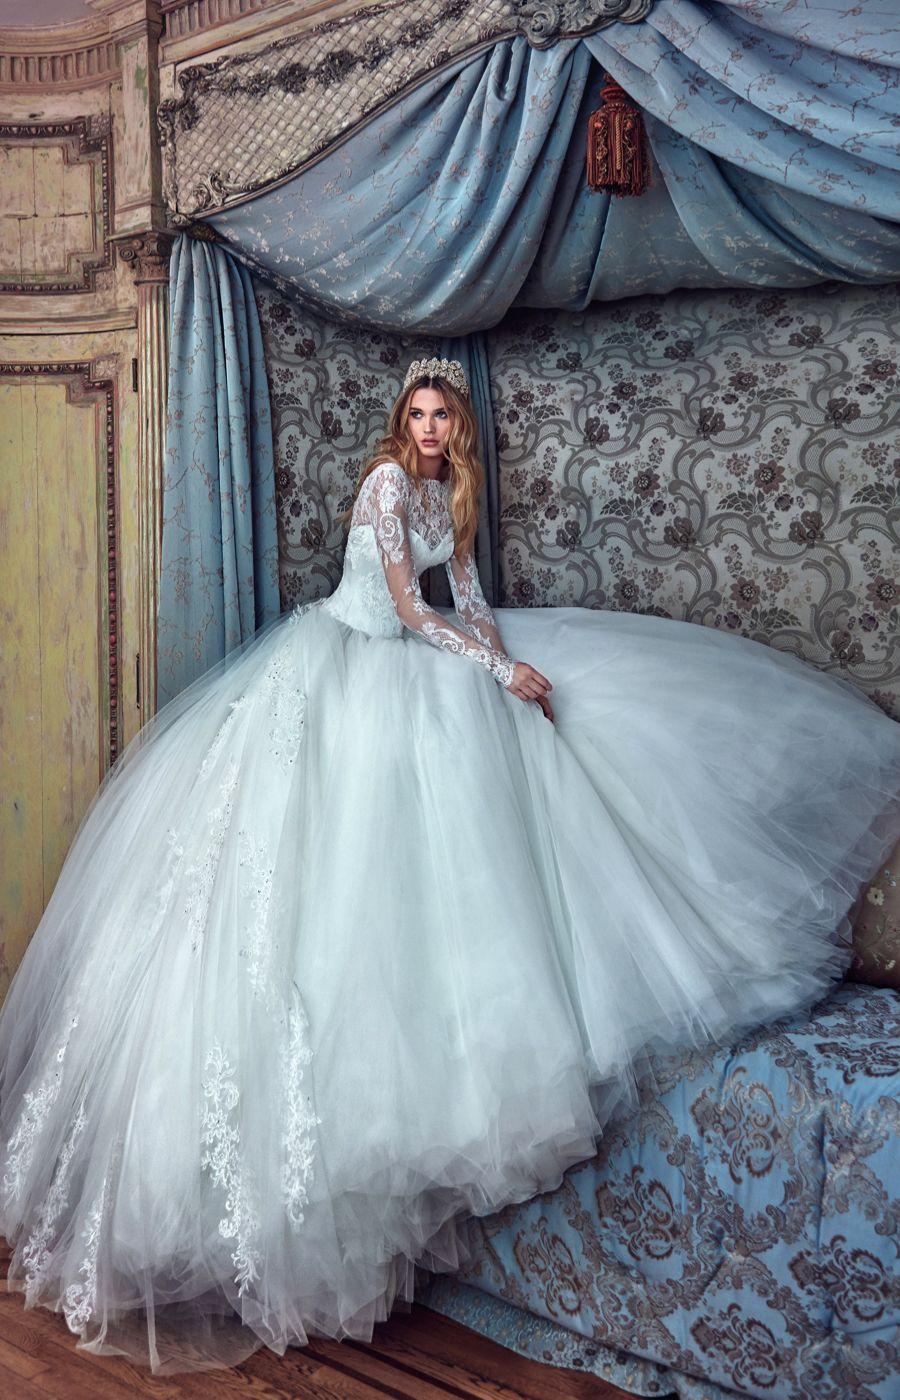 The seriously stunning 2017 Galia Lahav bridal collection